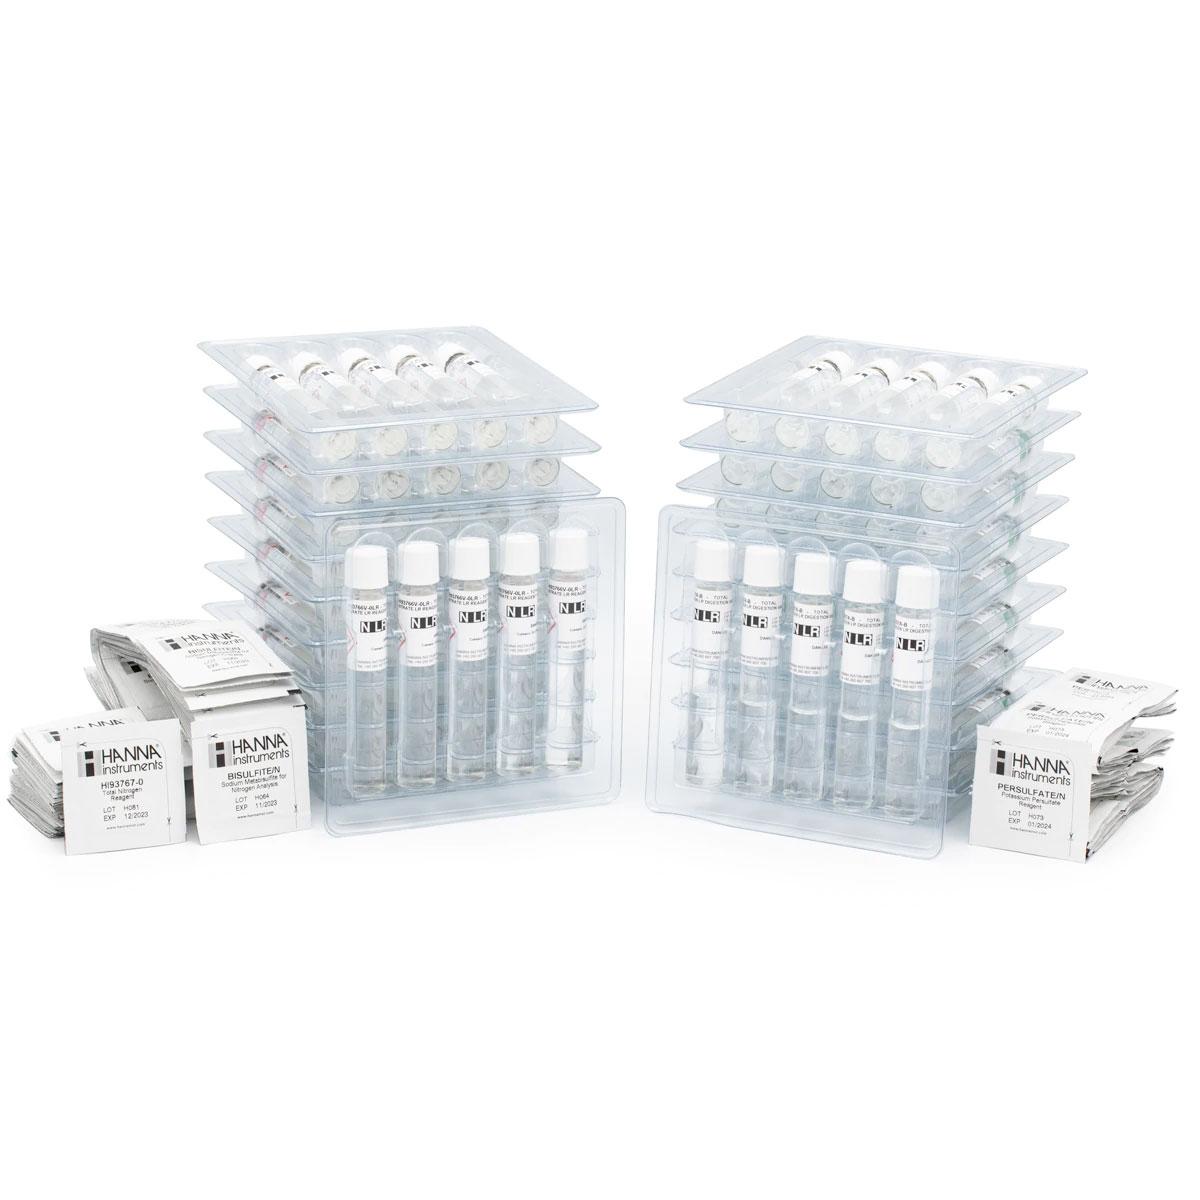 Total Nitrogen Low Range Reagents (50 tests) - HI93767A-50